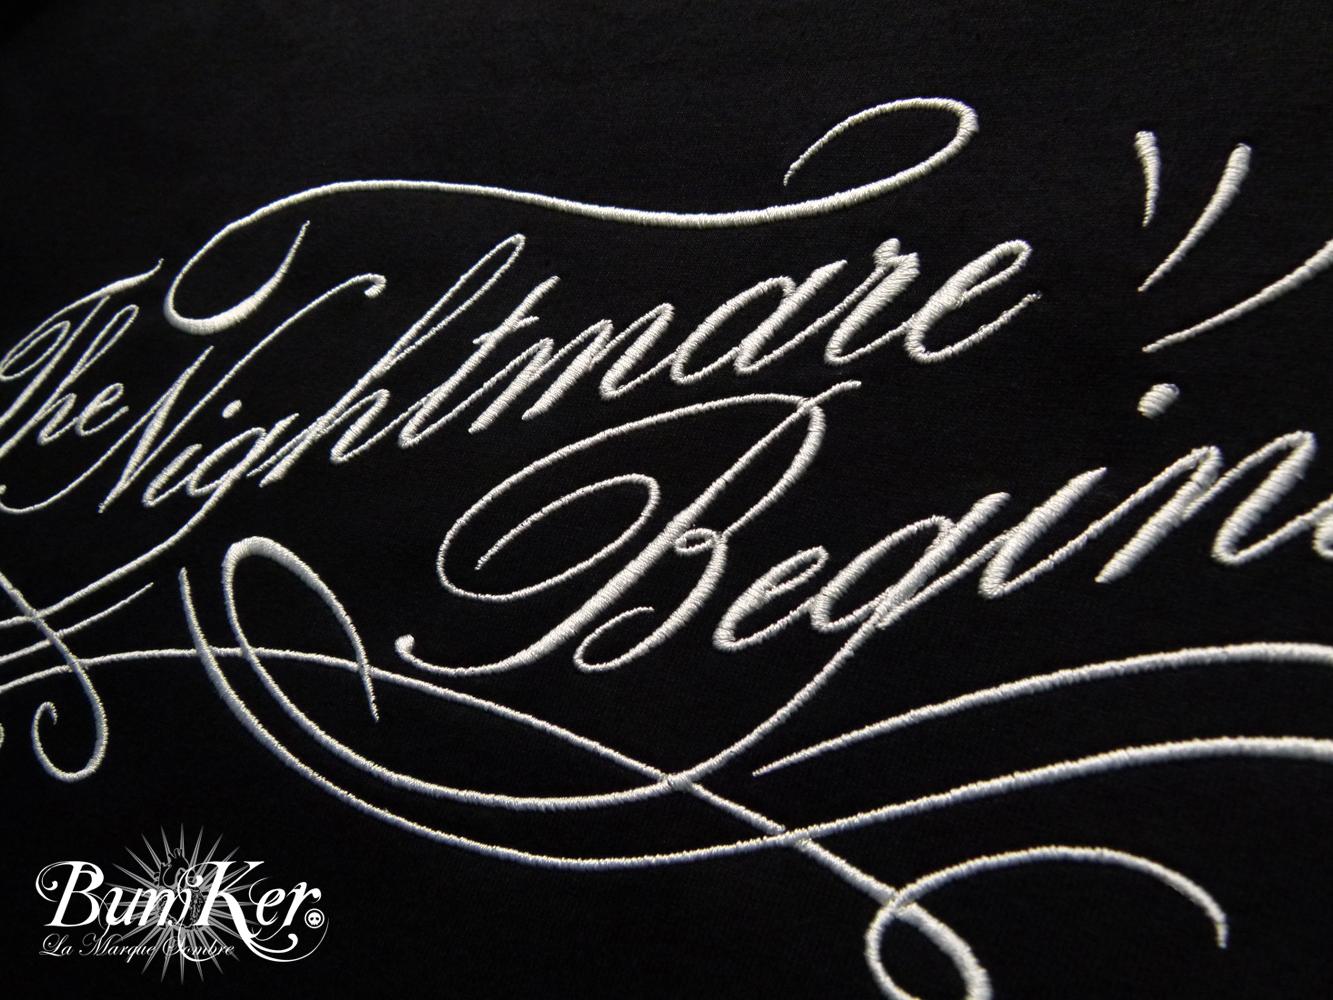 discount_week_embroidered_varsity_jacket_nightmare_begins_tattoo_lettering_and_vintage_skull_cardigans_and_sweaters_3.jpg